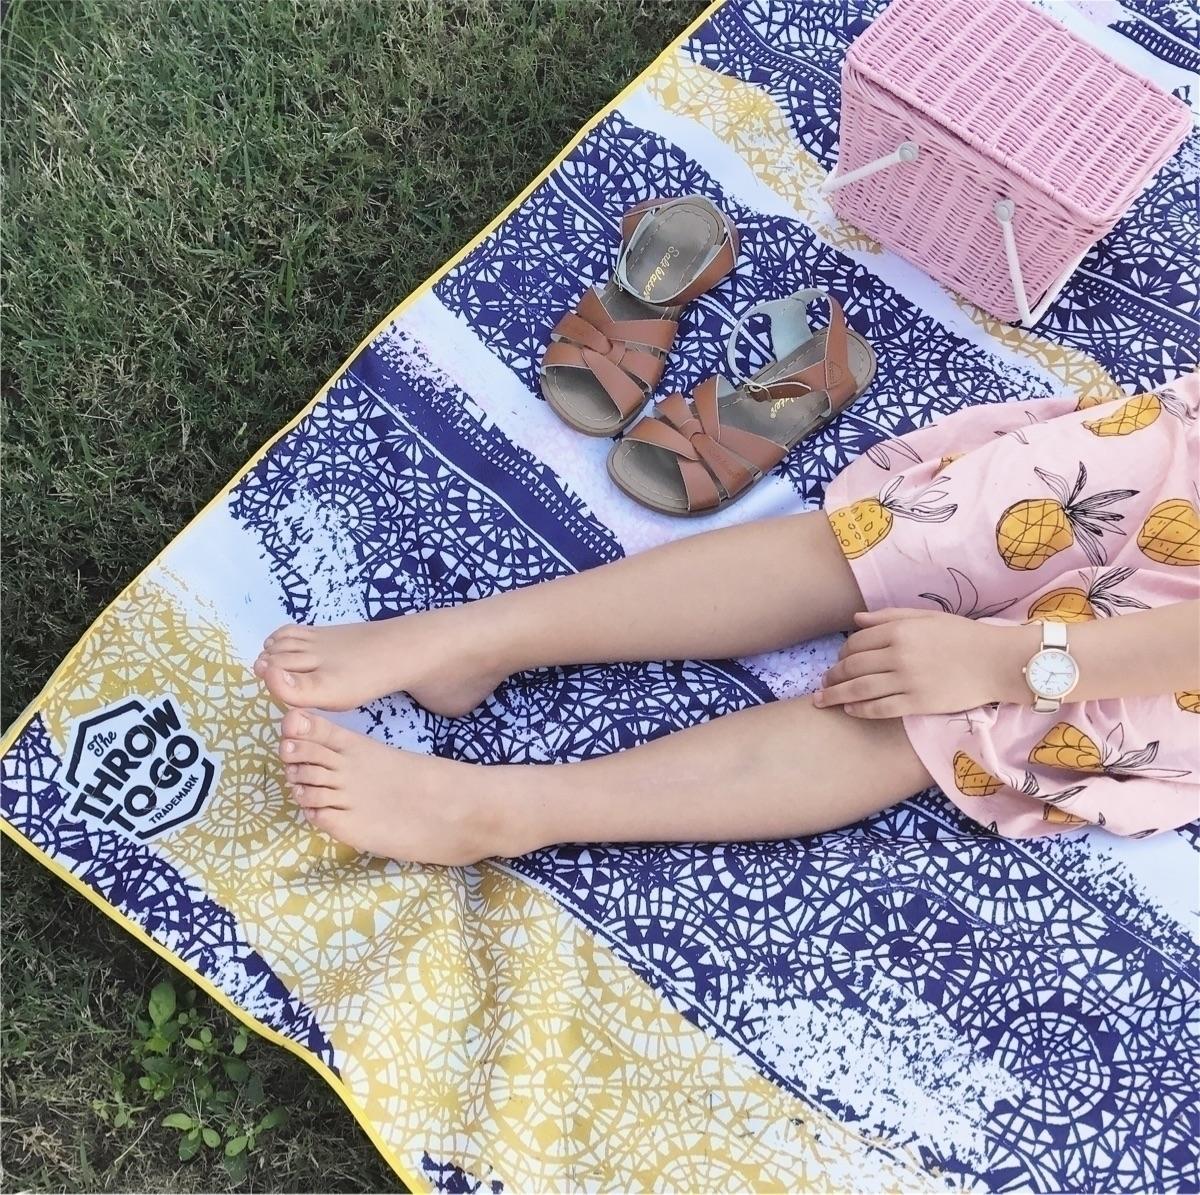 Sunday picnic  - ello, sunday, family - _misskara | ello